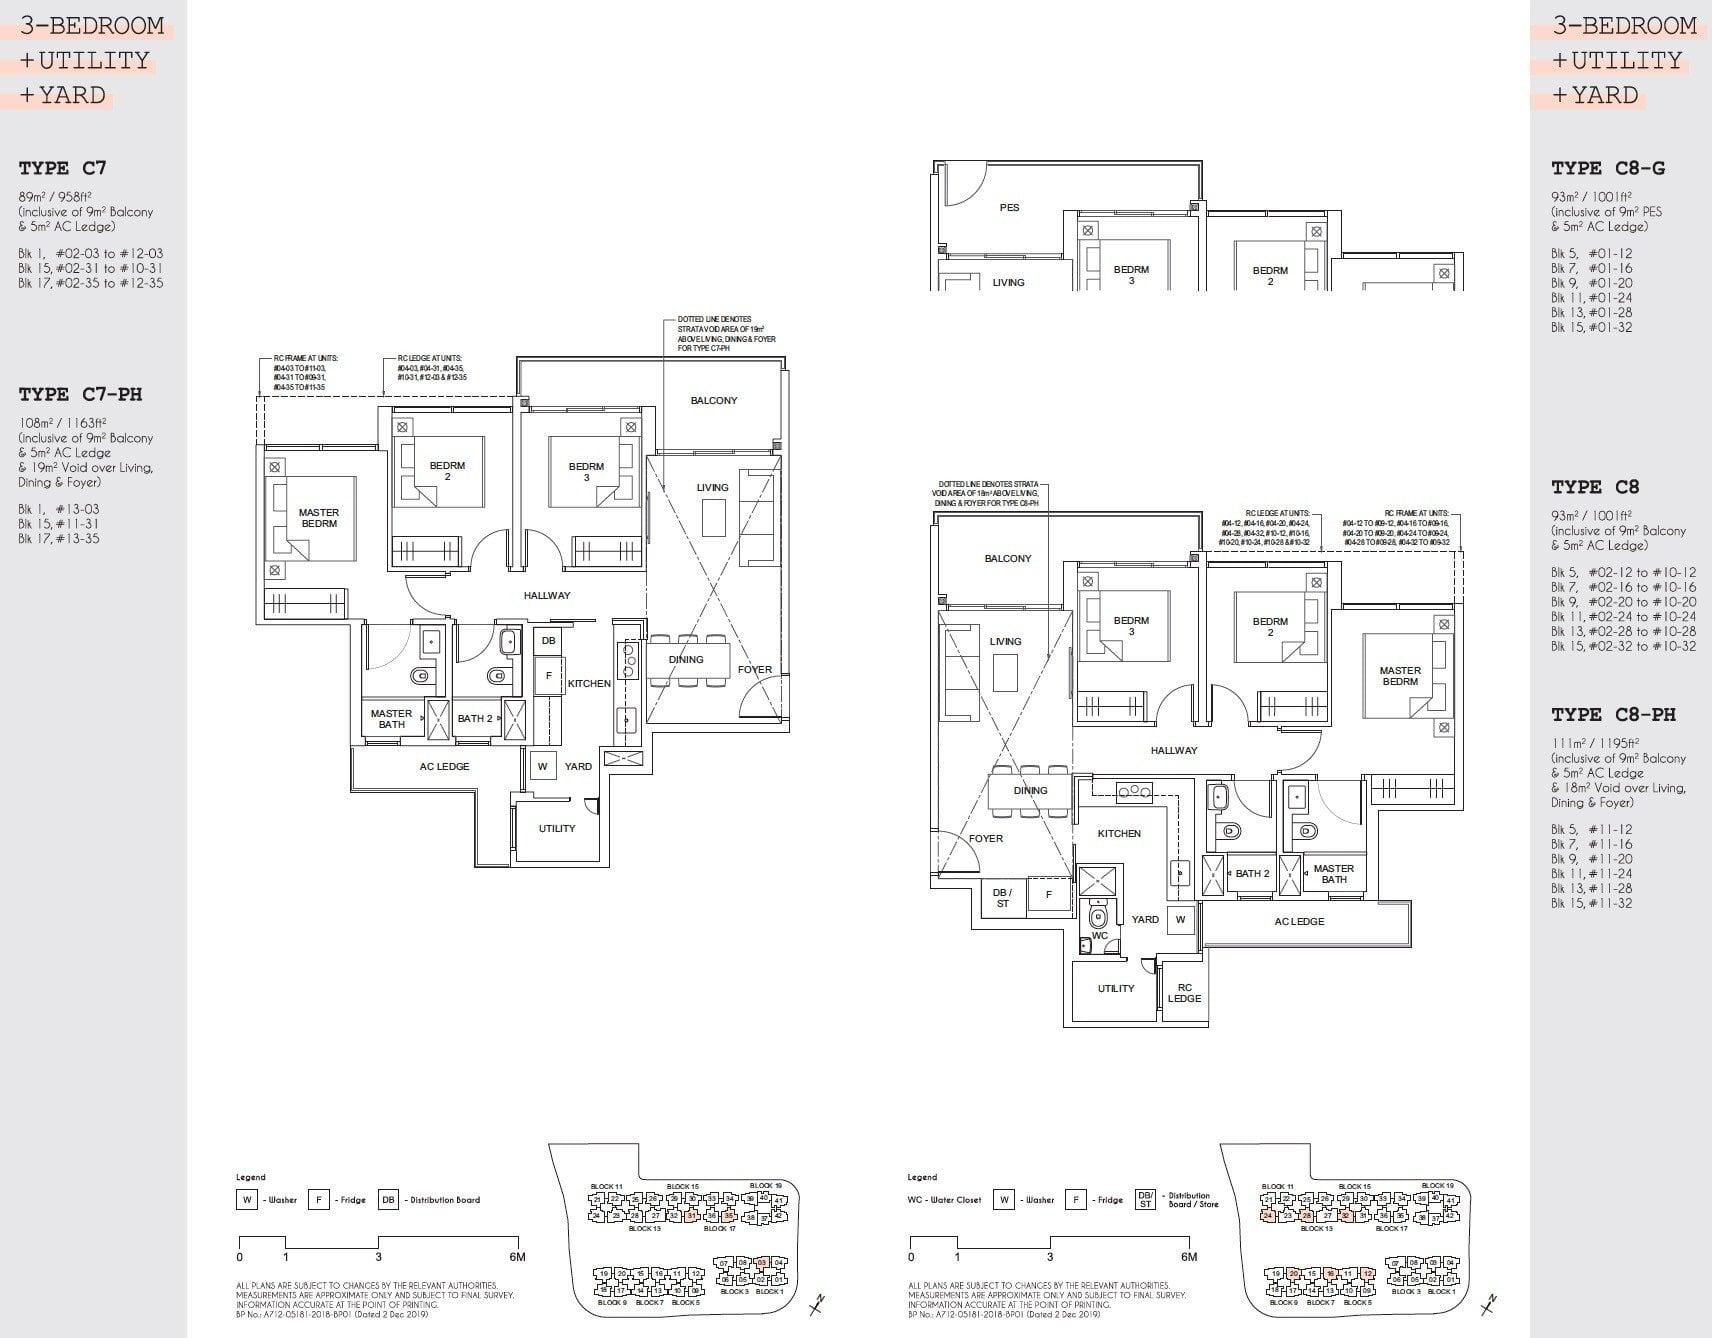 Parc Canberra floor plan floor plan 3BR-5